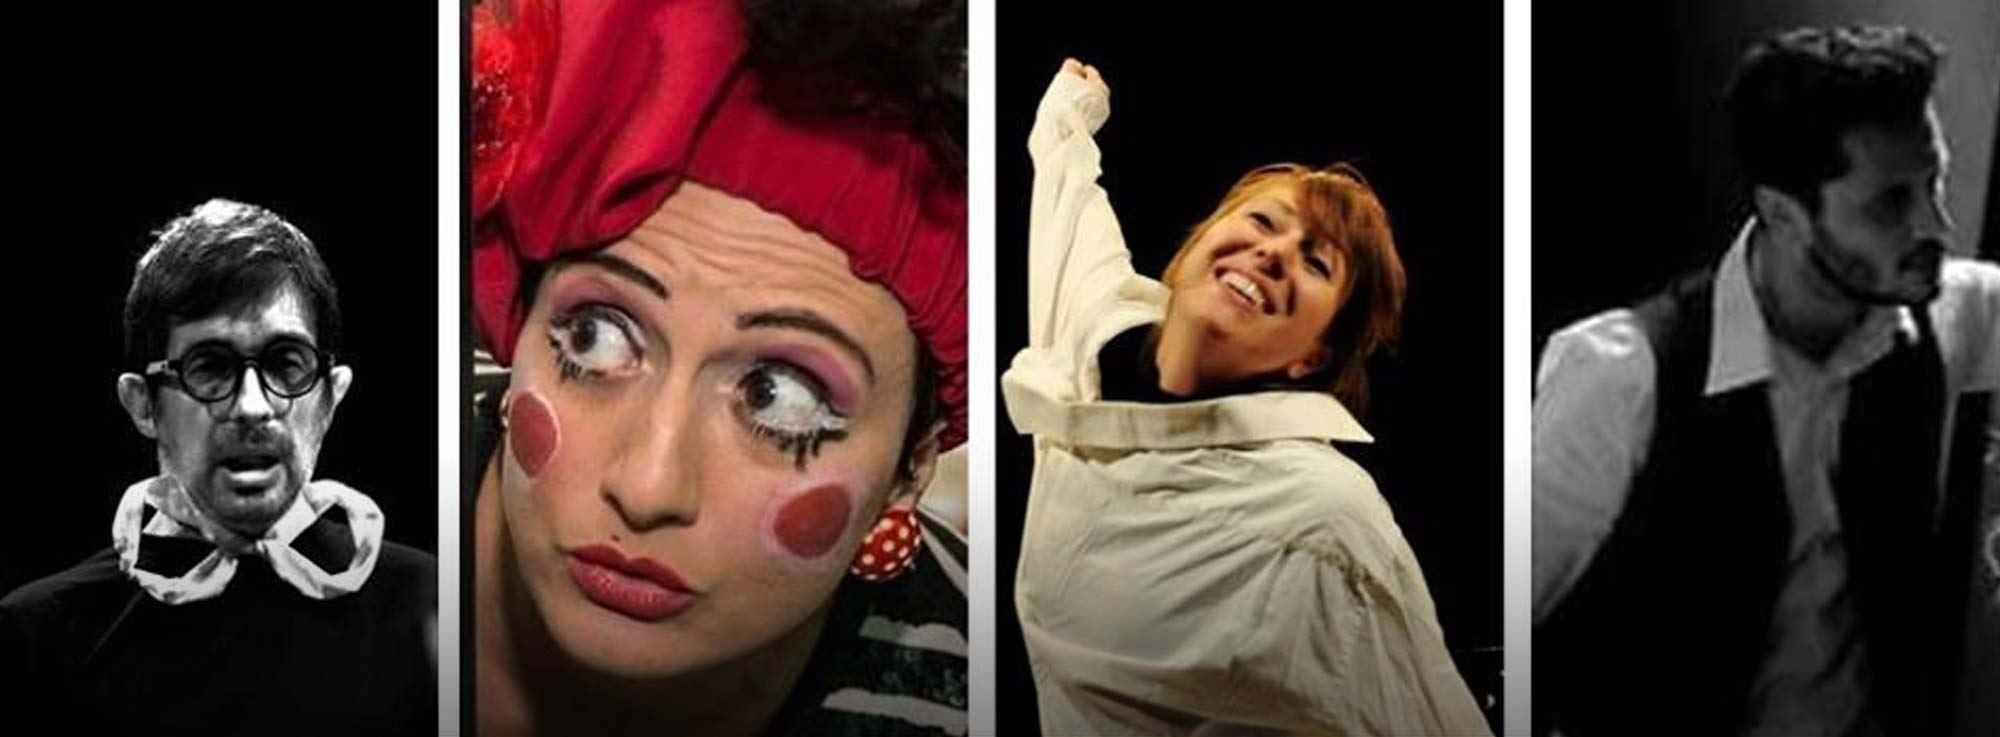 Bisceglie: Burle d'Amore in Maschera